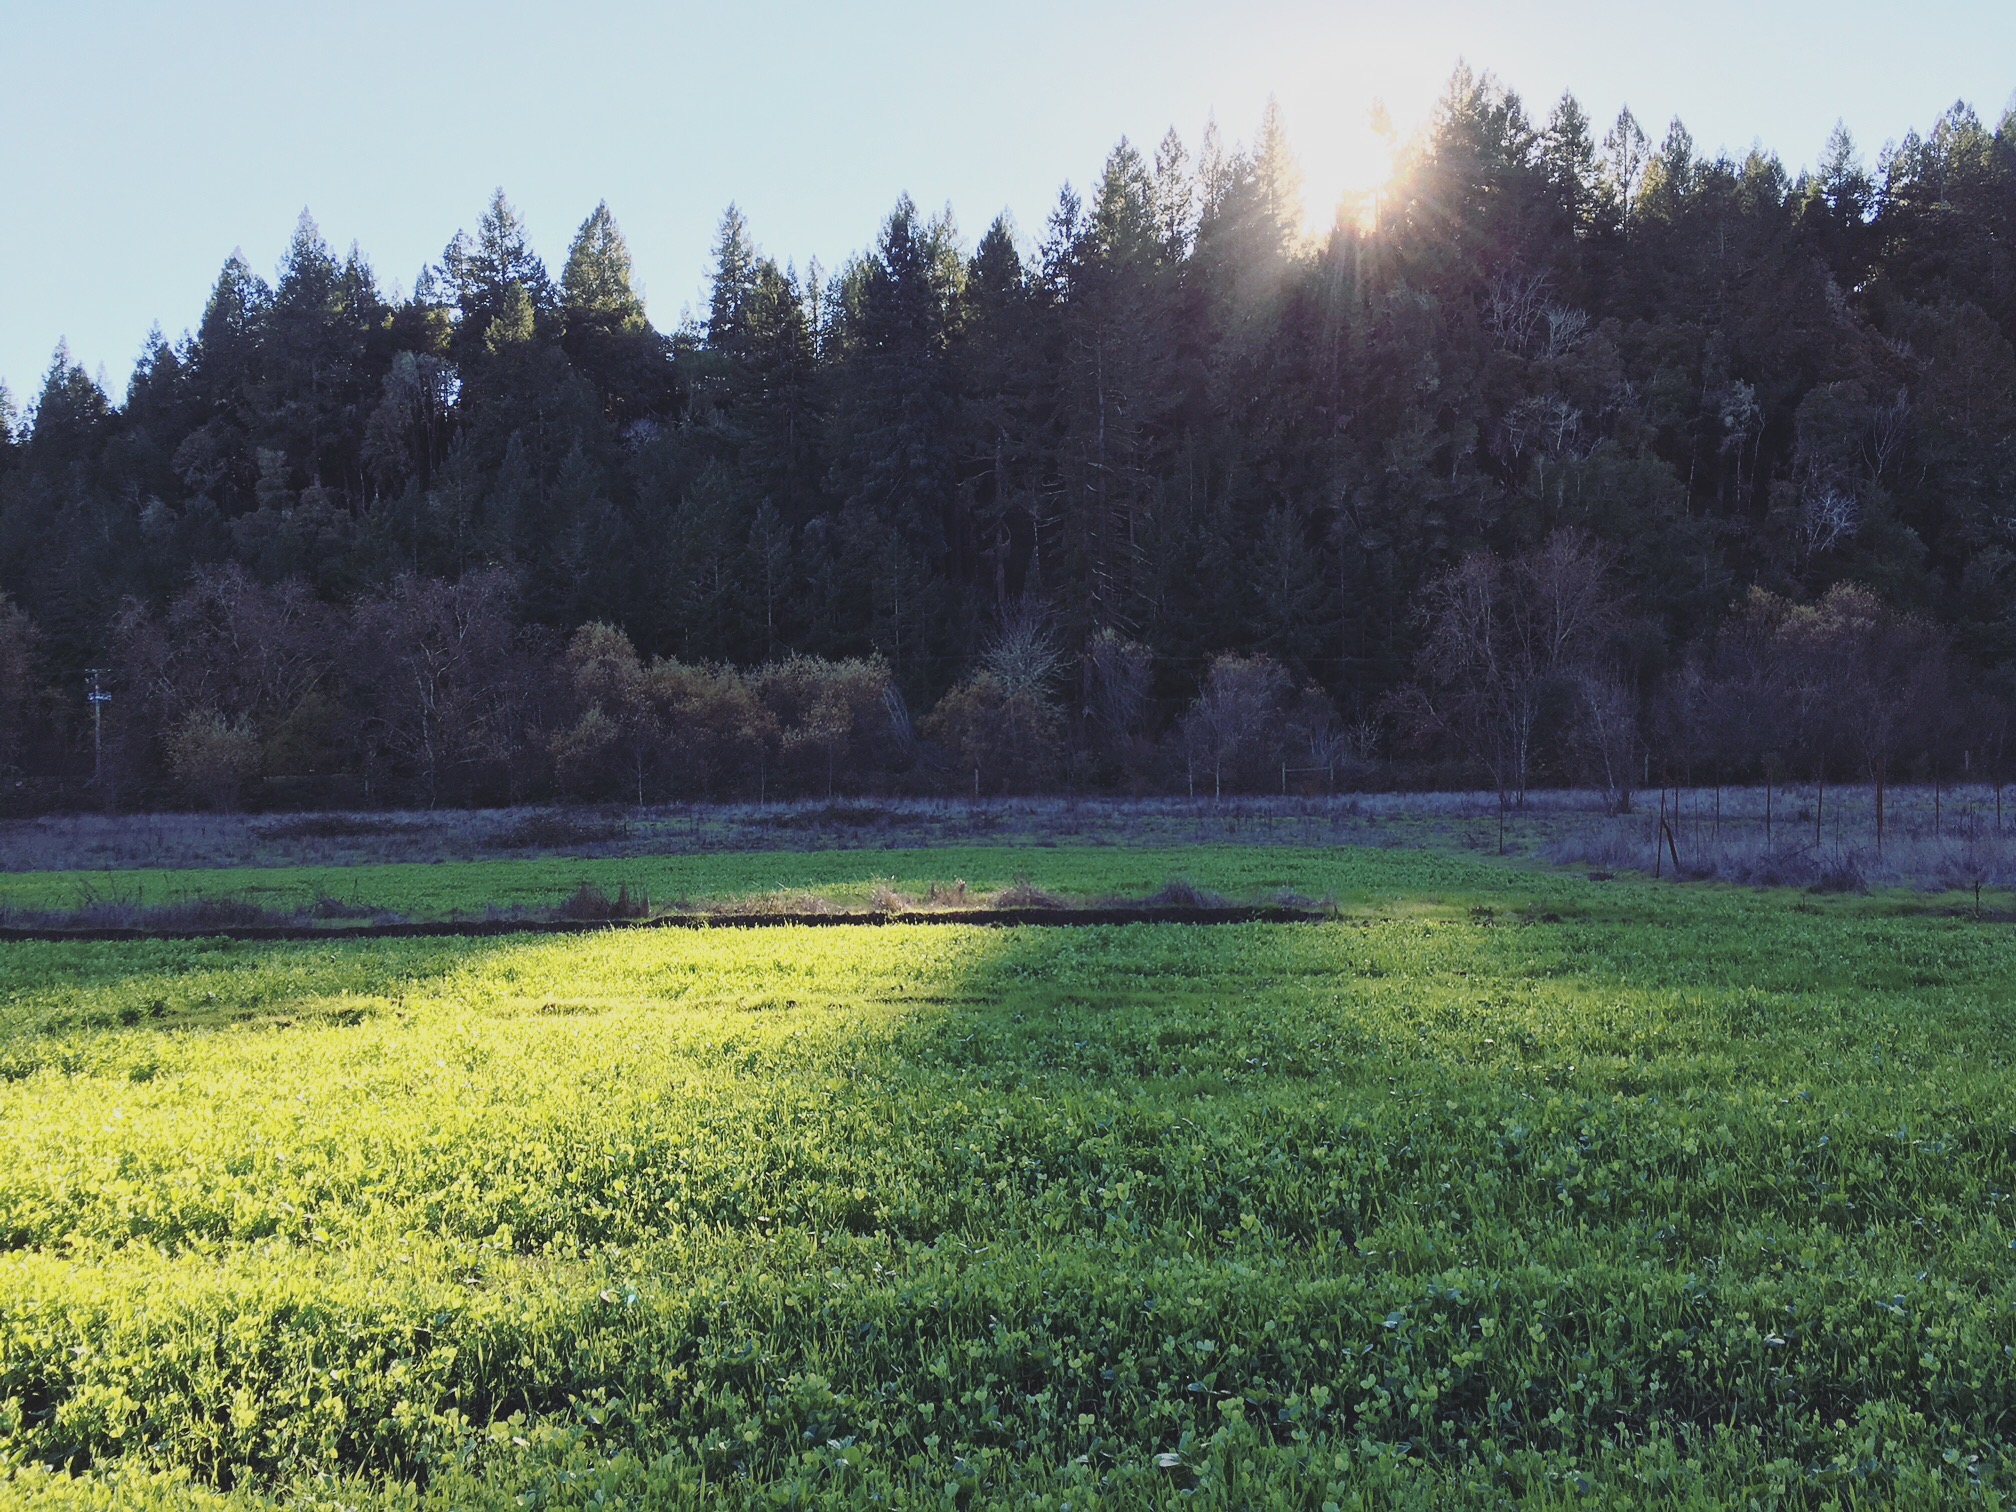 Next season's intensive veggie fields awash in long fall shadows